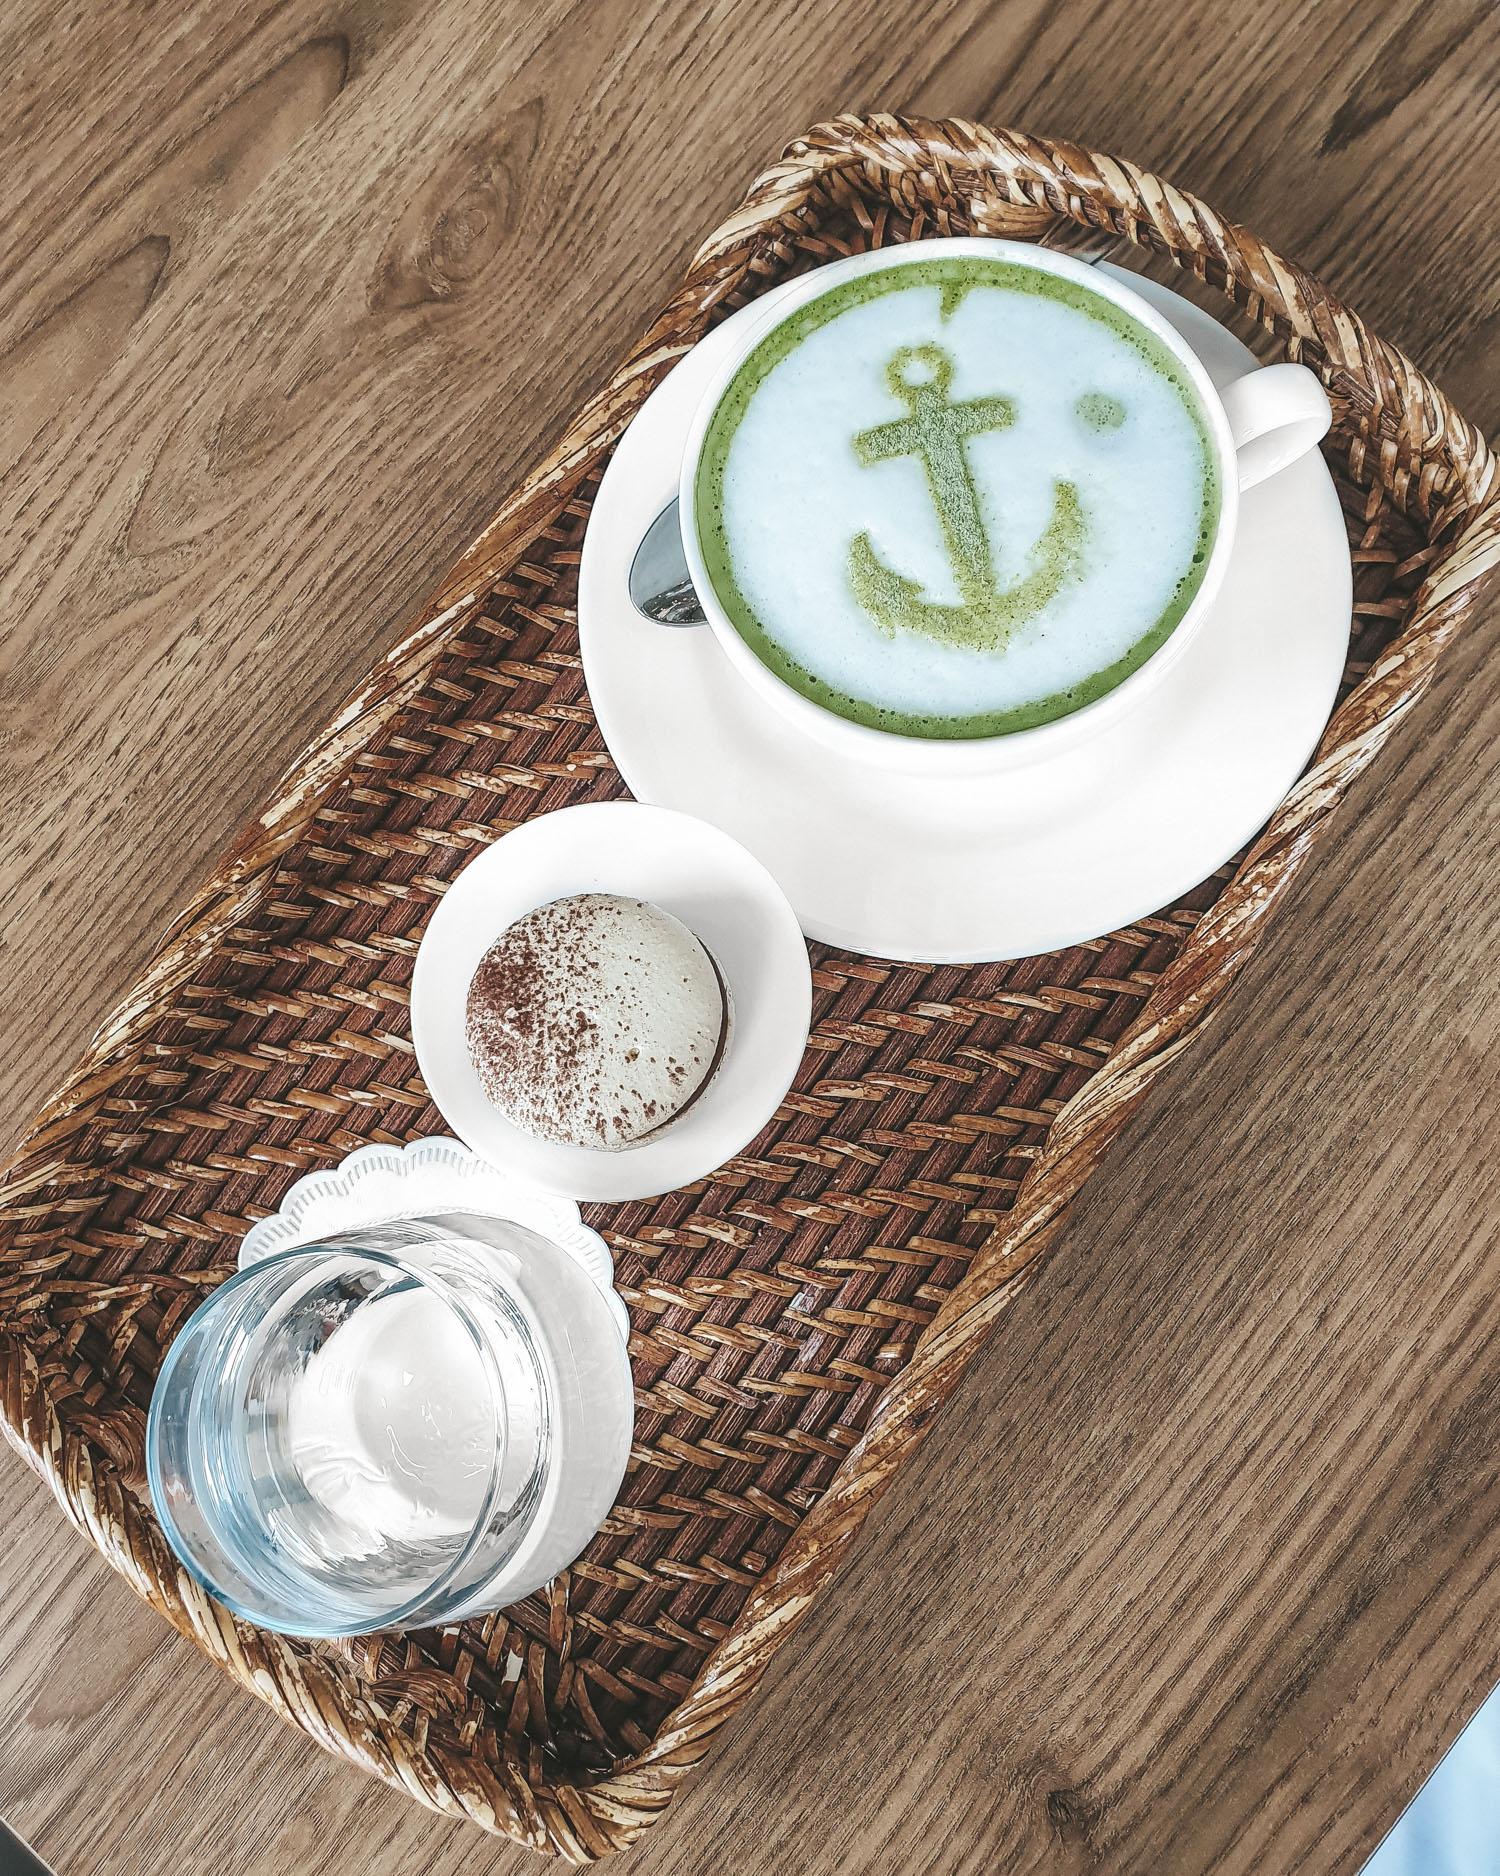 matcha latte from Hmpton's Cafe Dubai